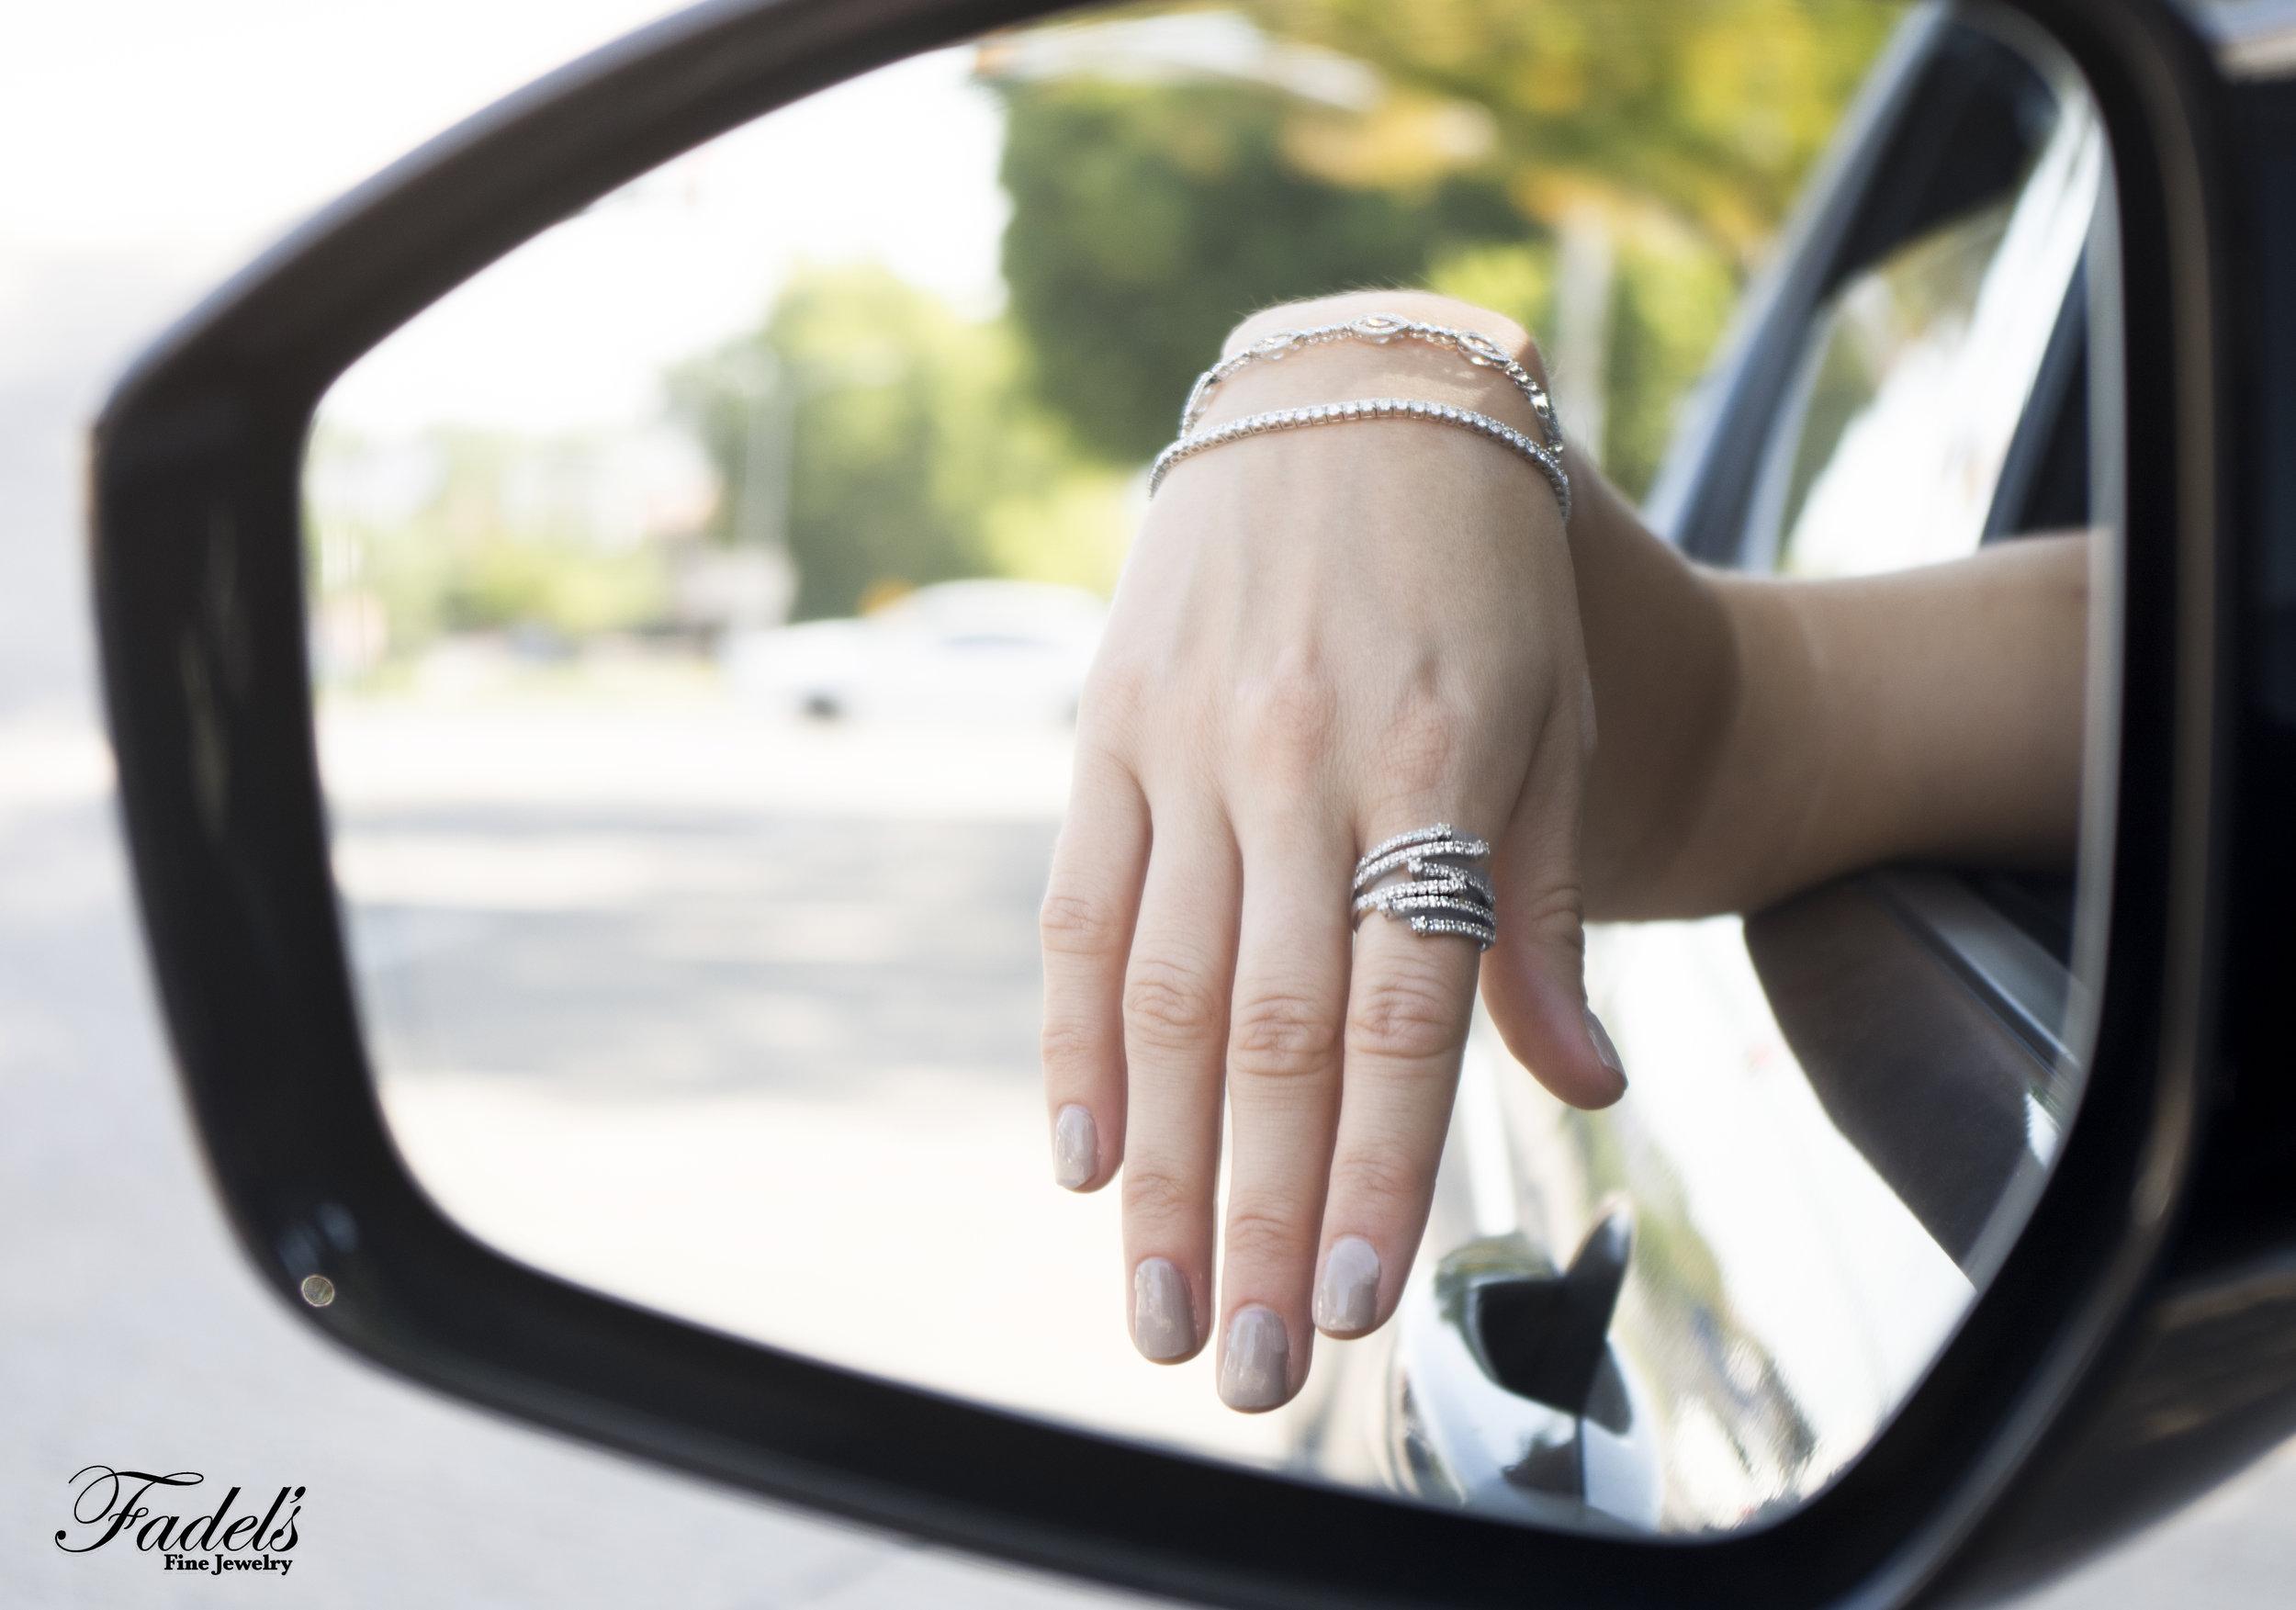 Car mirror with diamond tennis bracelet and diamond stacking ring.JPG